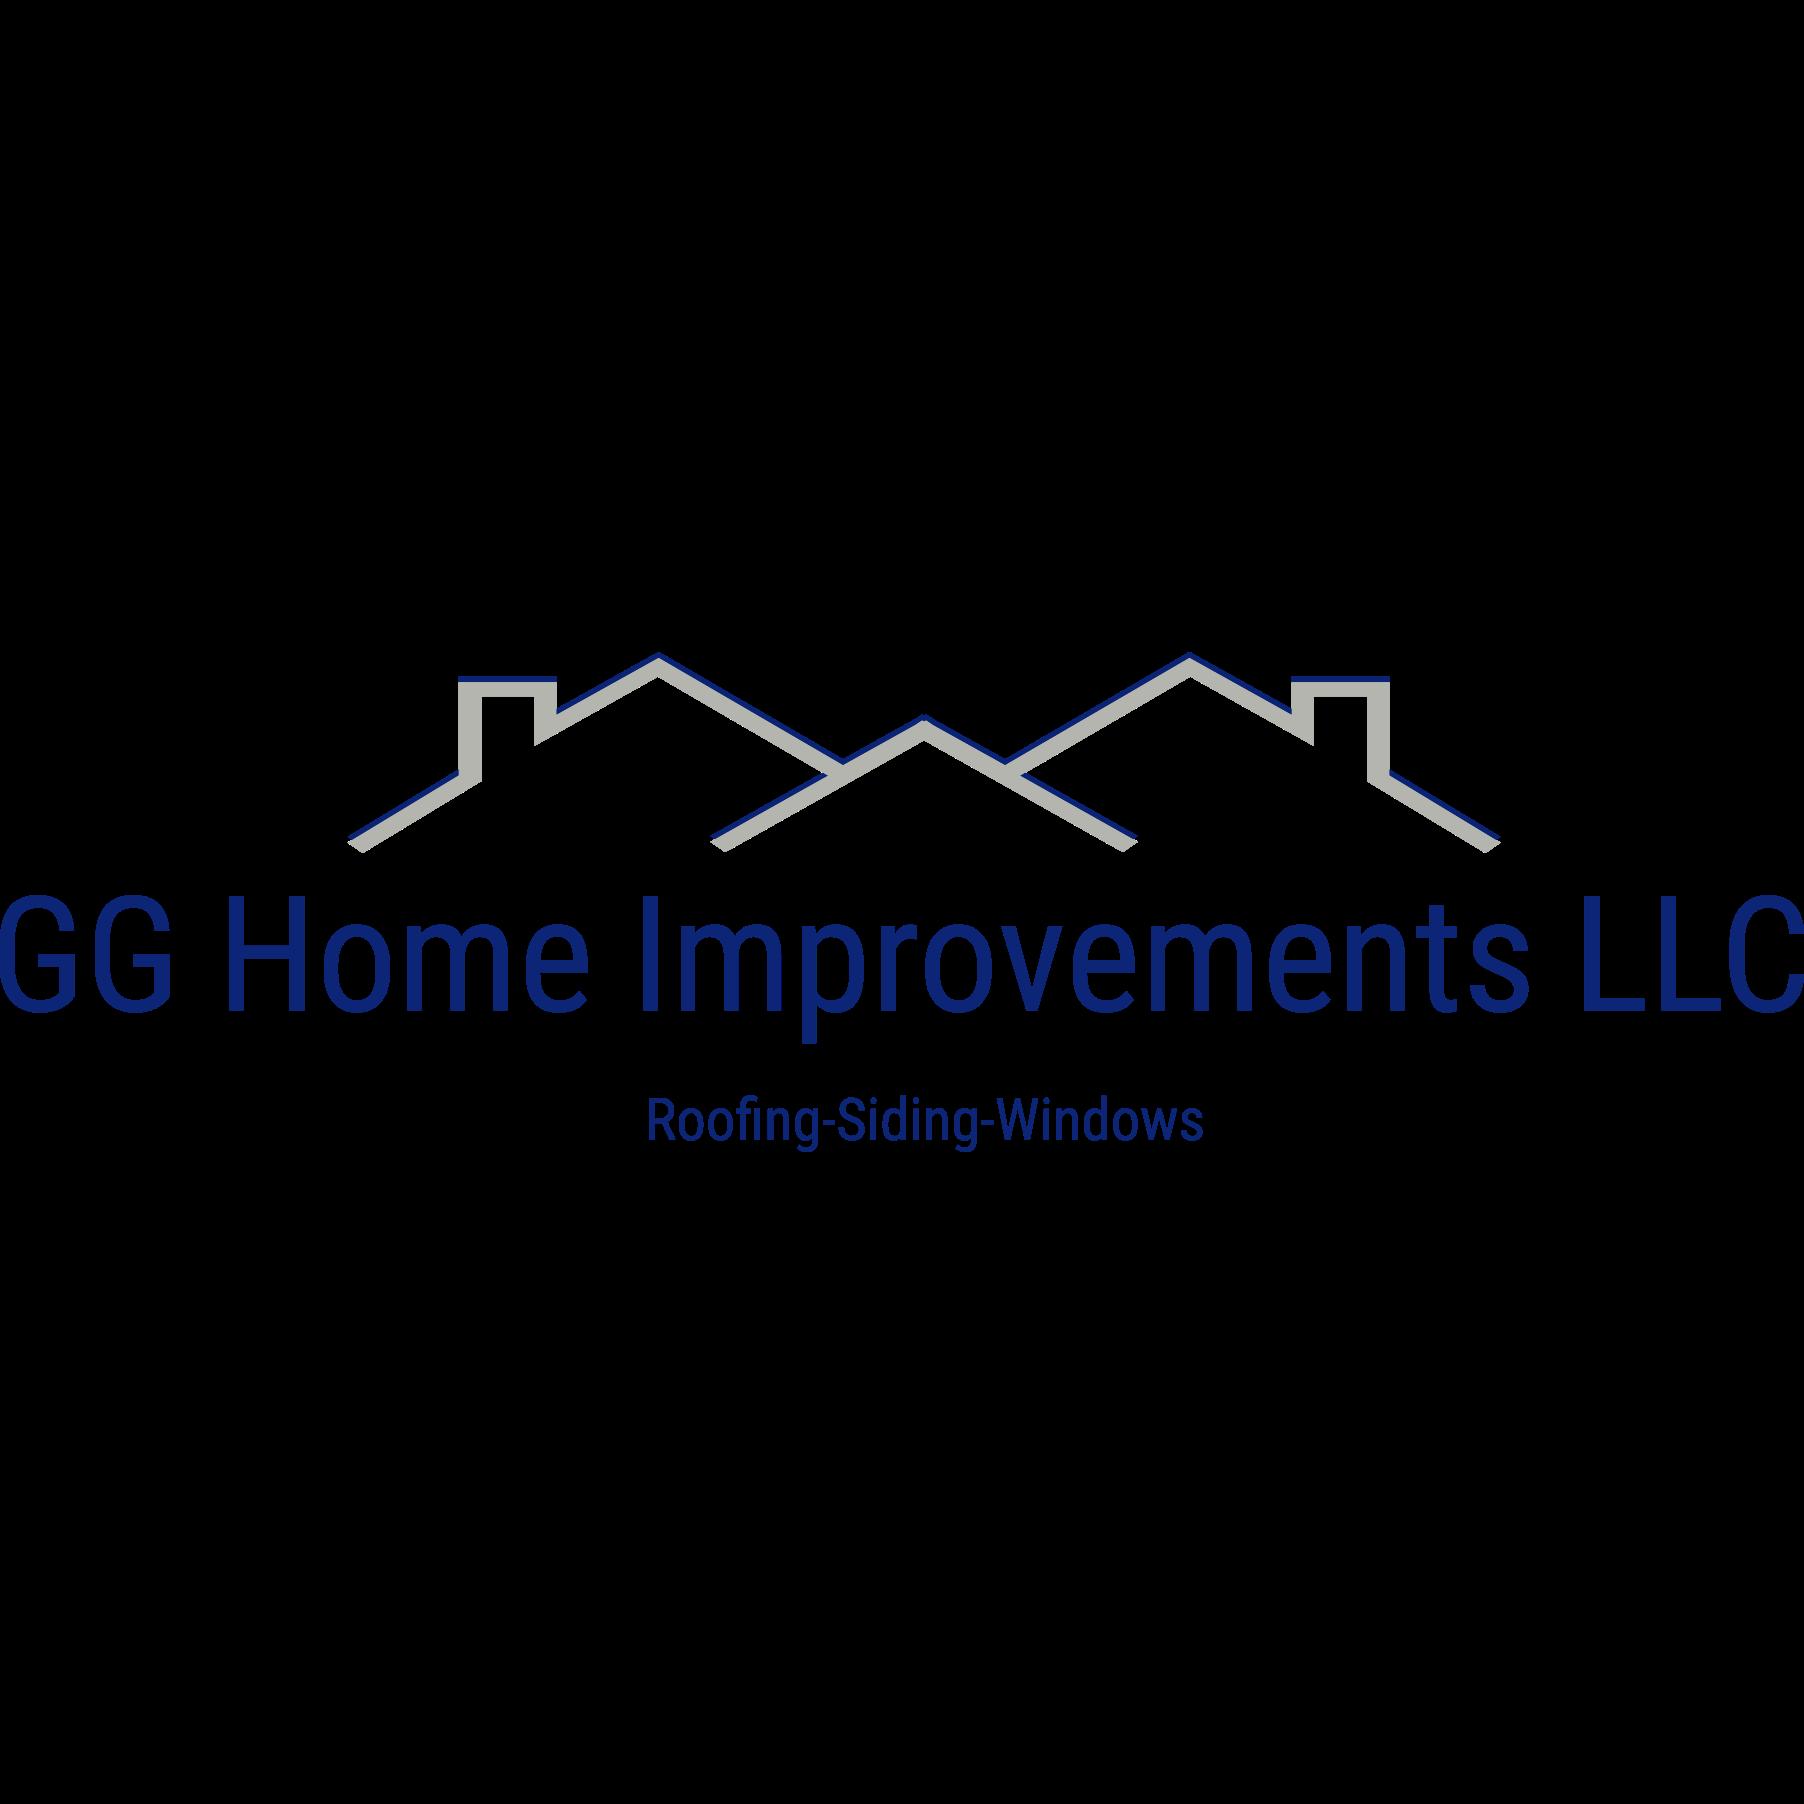 GG Home Improvements LLC